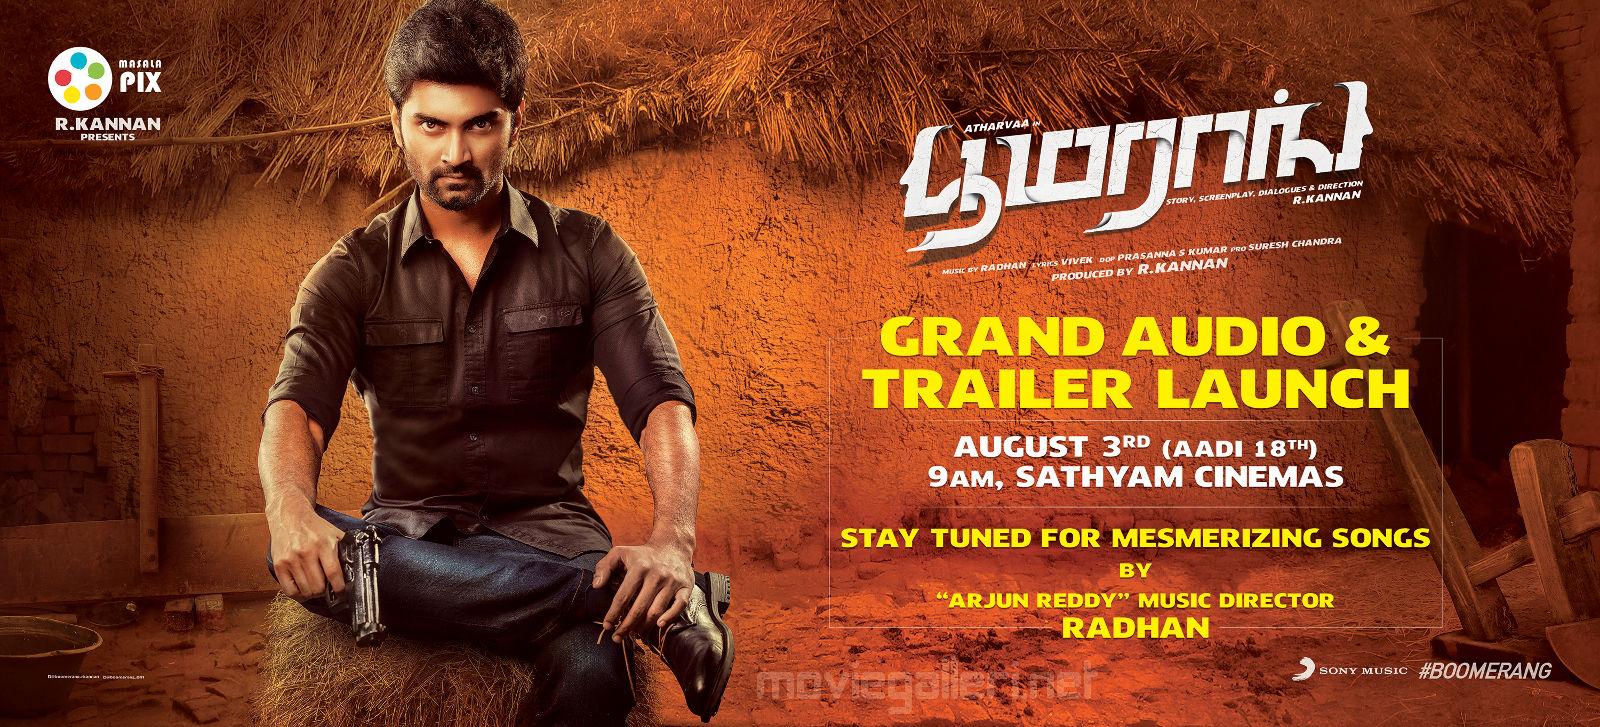 Atharvaa Murali's musical 'Boomerang' from August 3